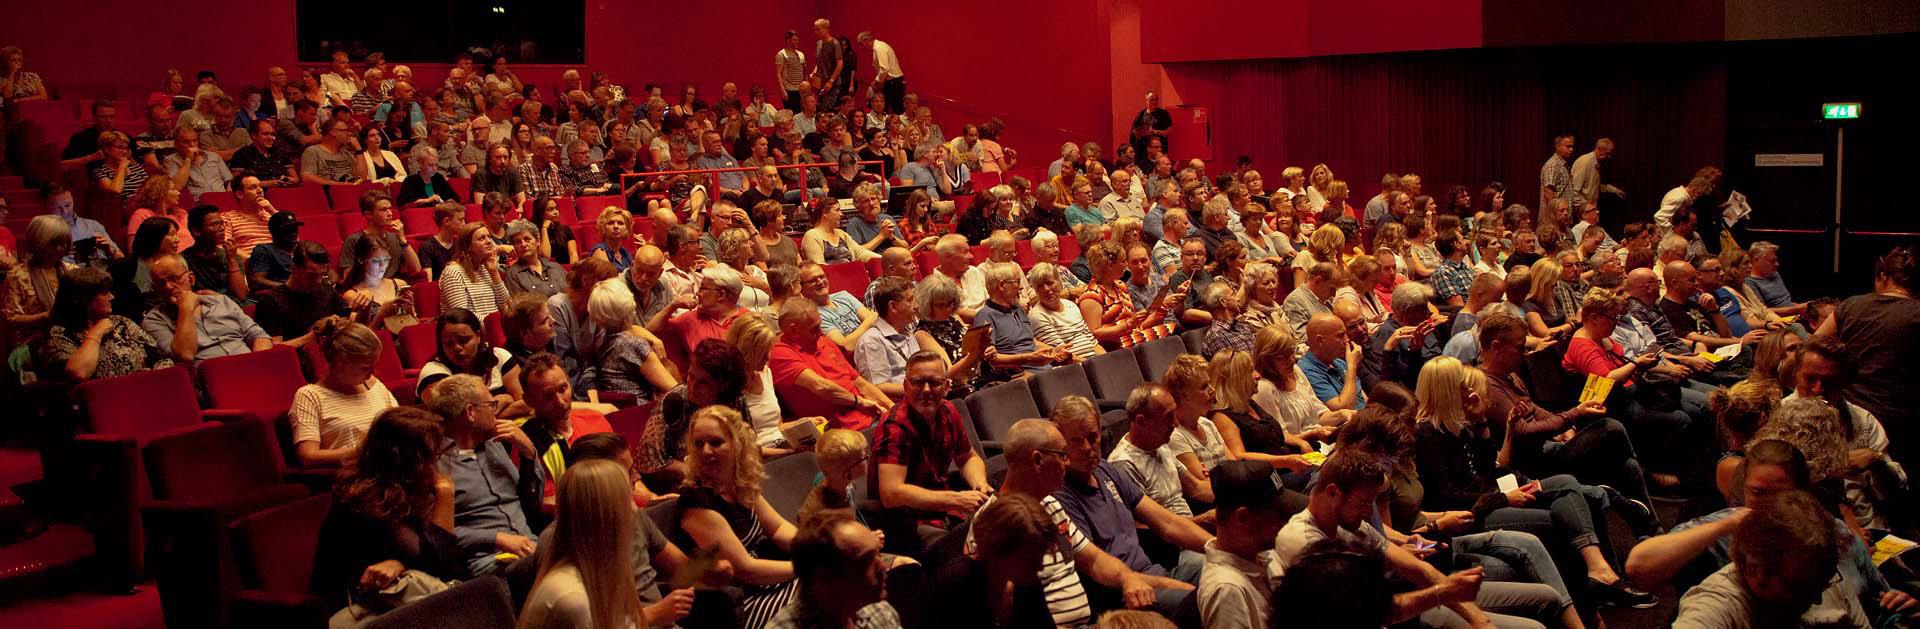 Theaters en Podia Achterhoek - Liemers